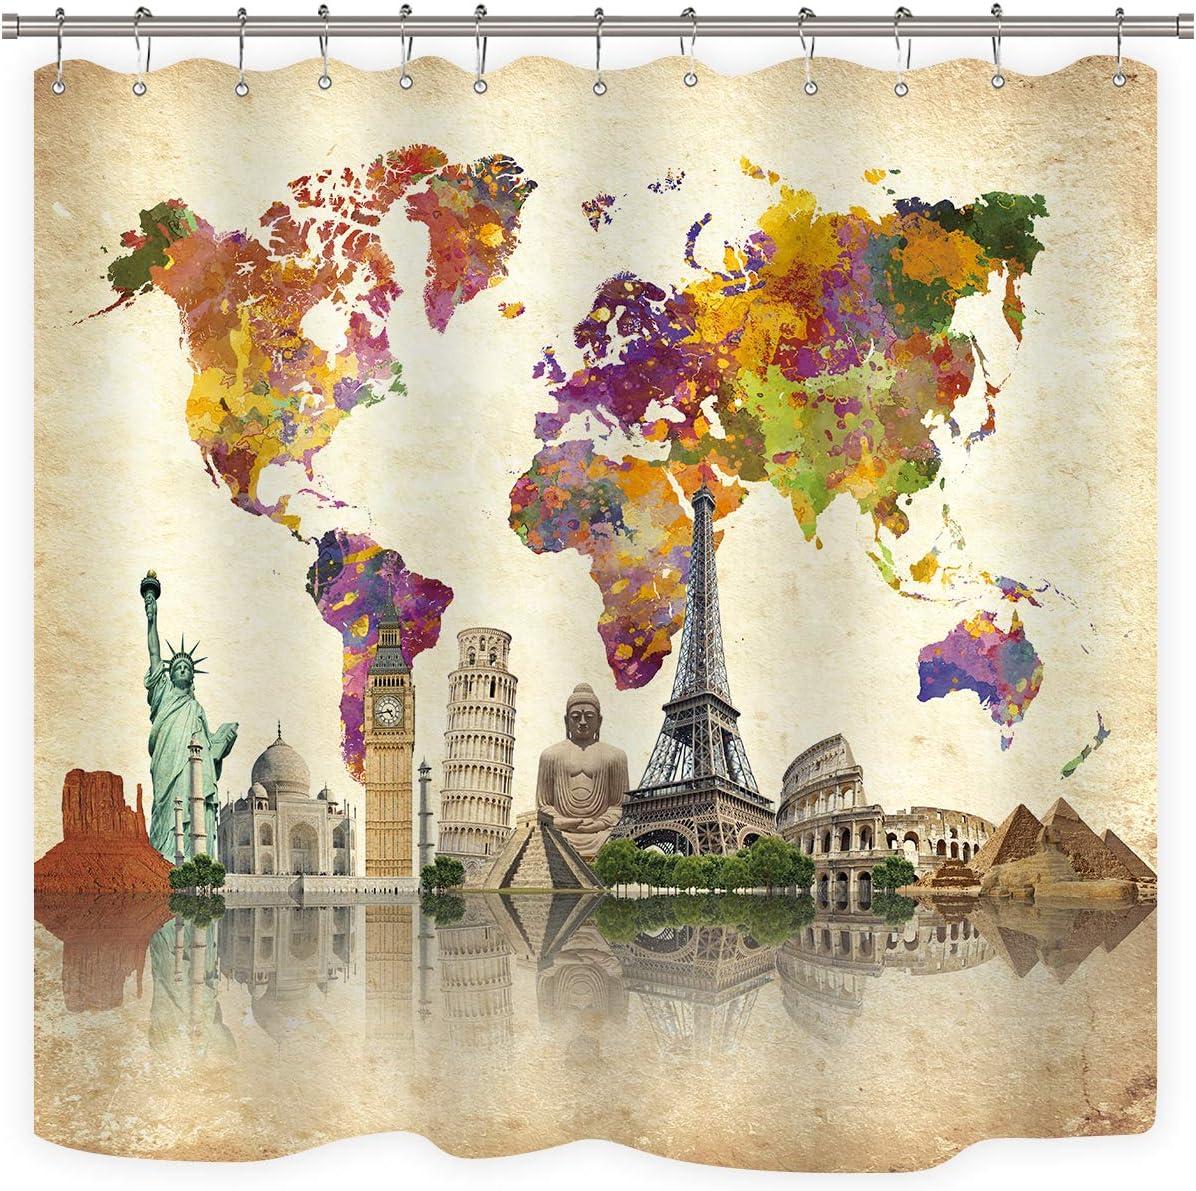 Riyidecor Vintage World Map Shower Curtain Wanderlust Landmark Spot Cultural Statue of Liberty Big Ben Decor Fabric Set Polyester Waterproof 72x72 Inch with 12 Pack Plastic Hooks